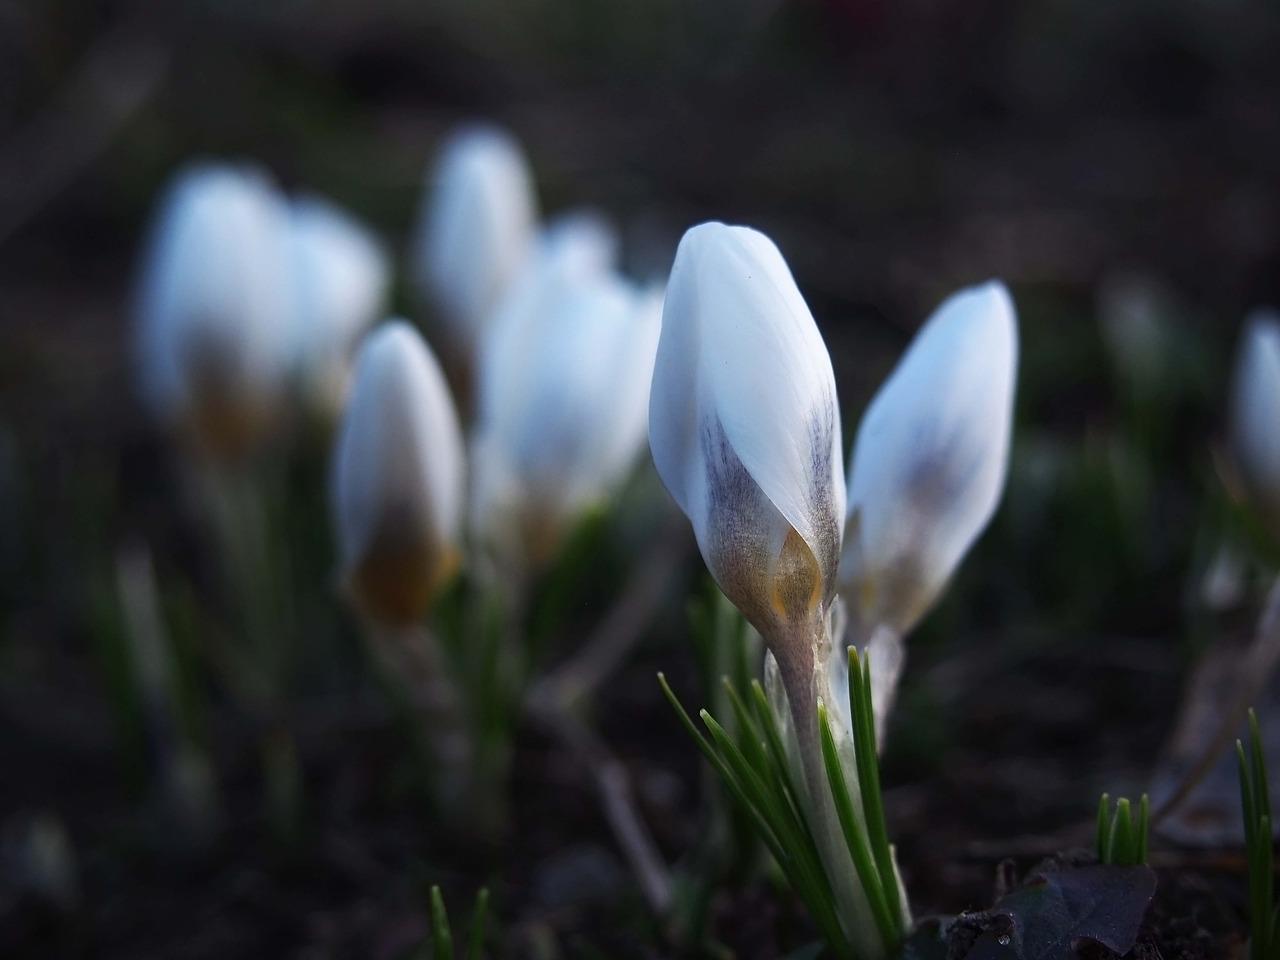 Springkrokusflowersbloomingnature Free Photo From Needpix